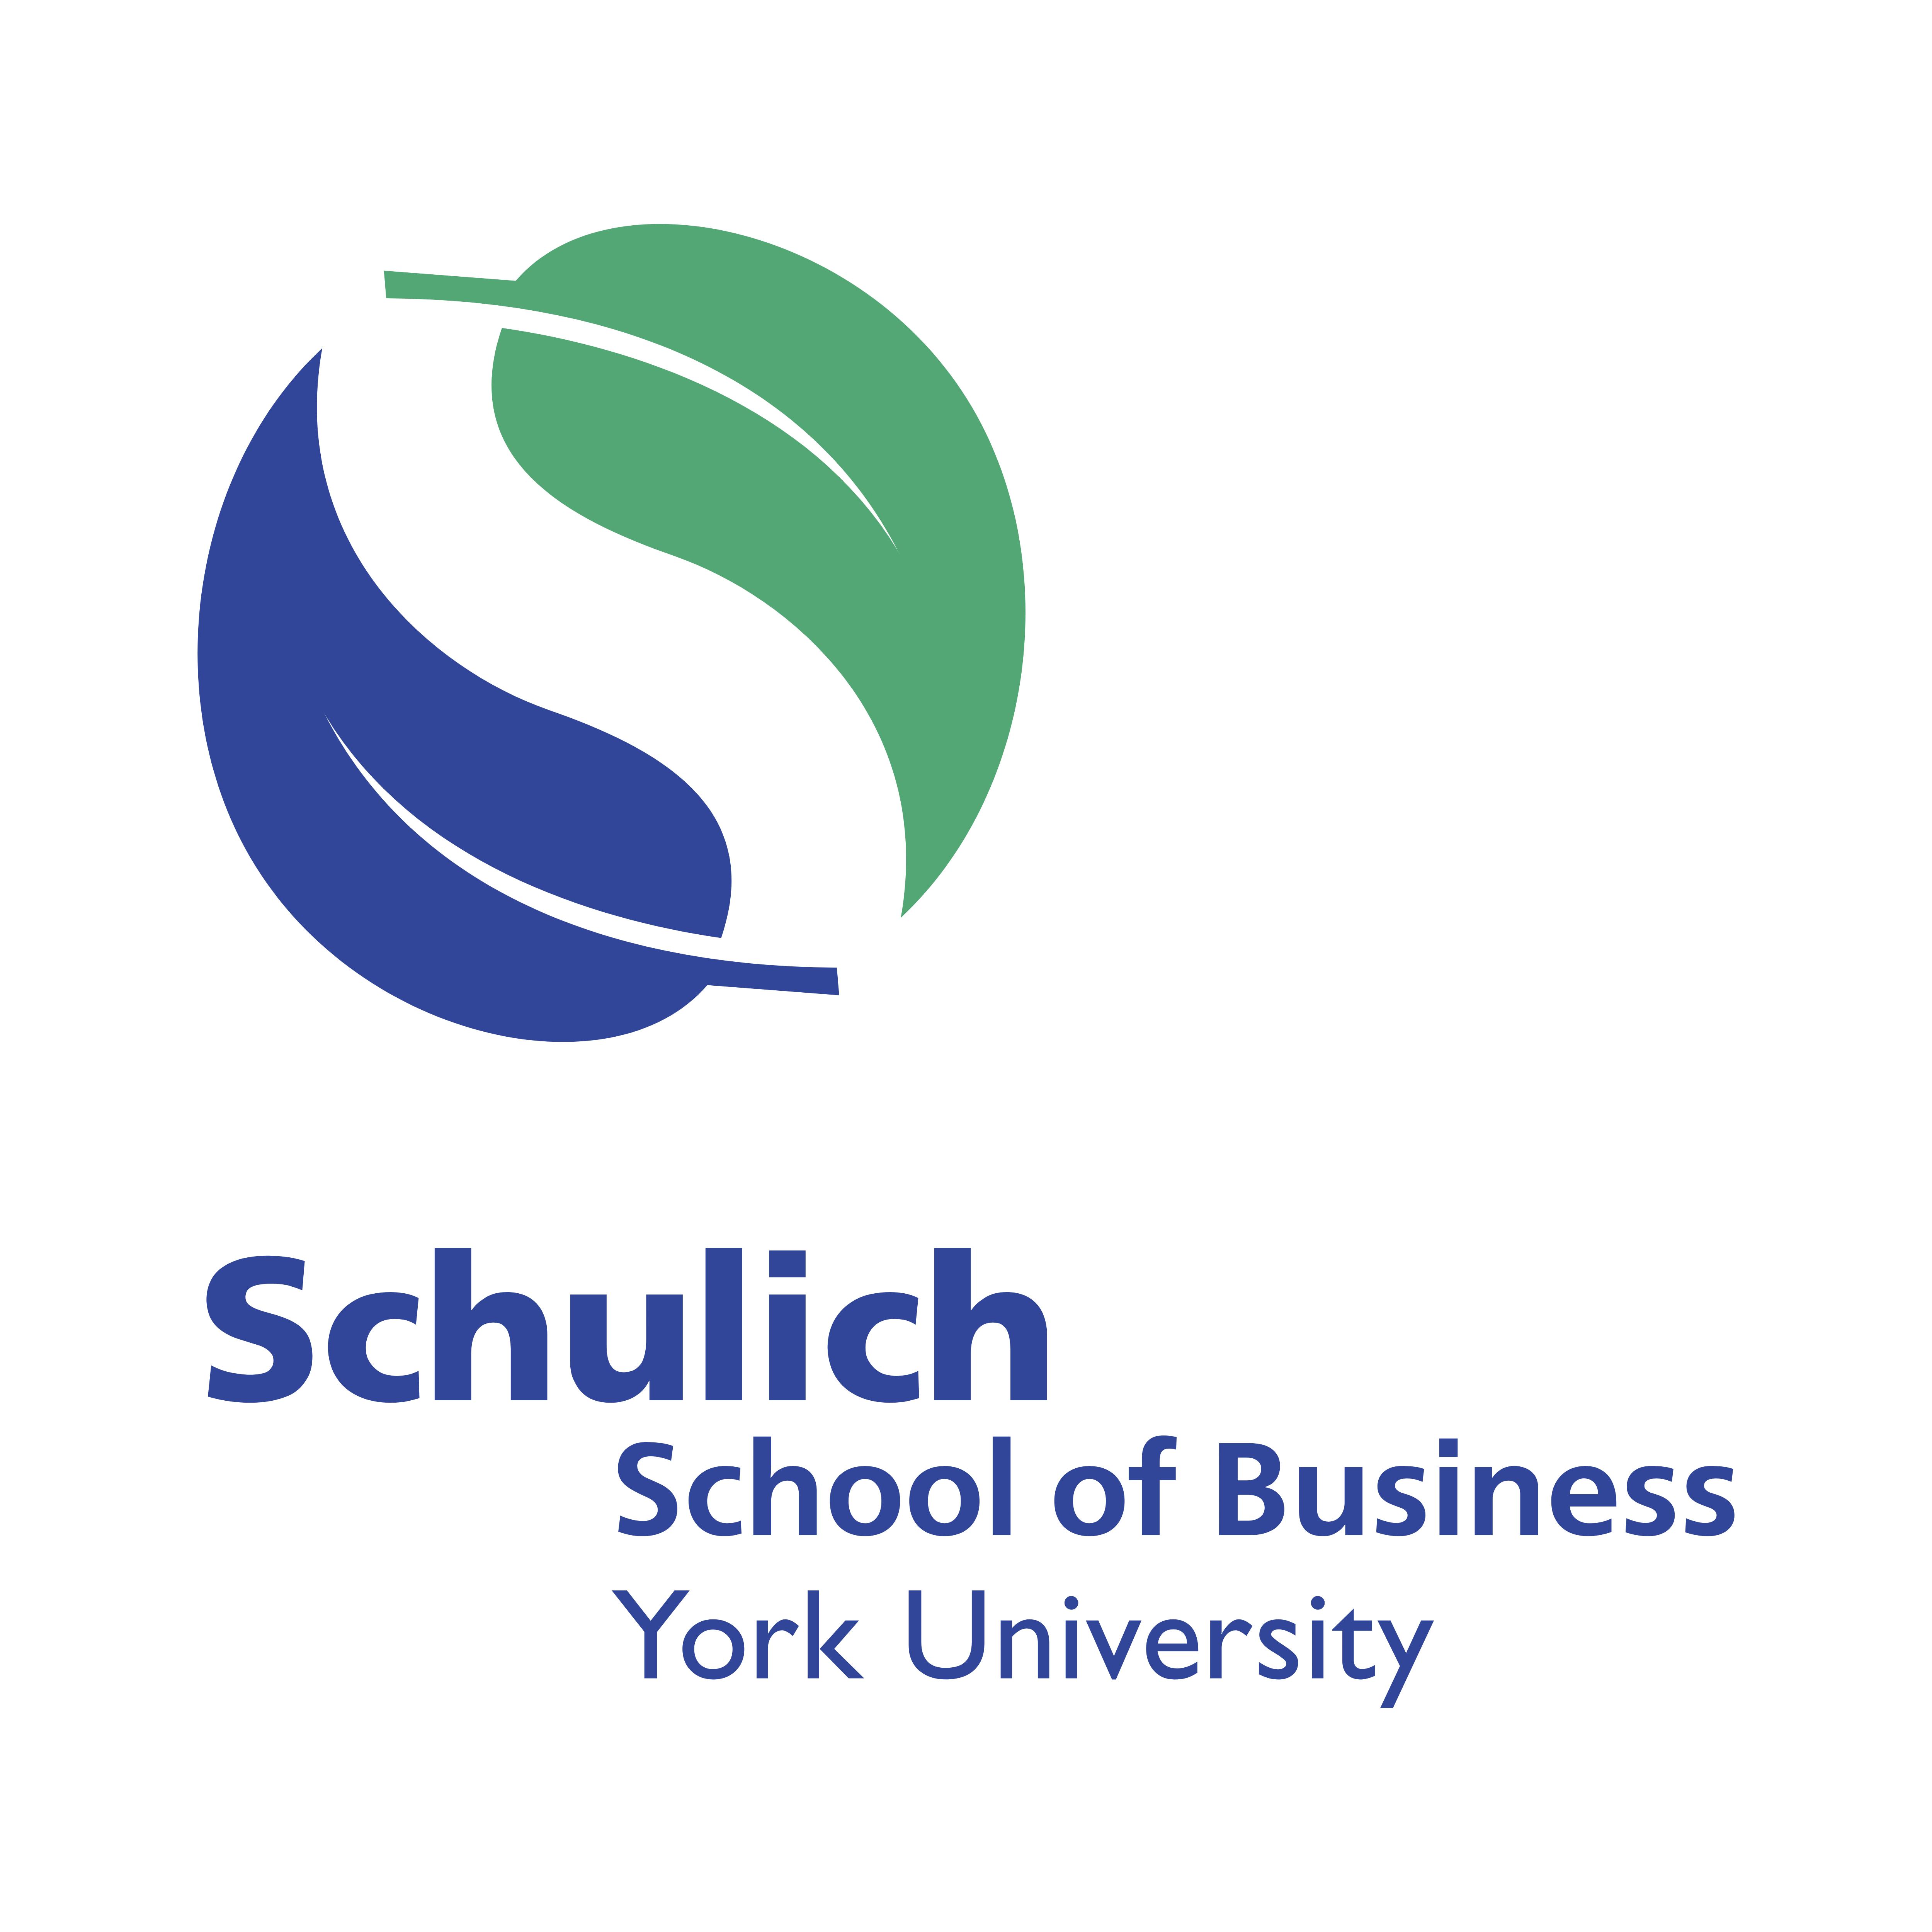 Schulich School of Business – Logos Download